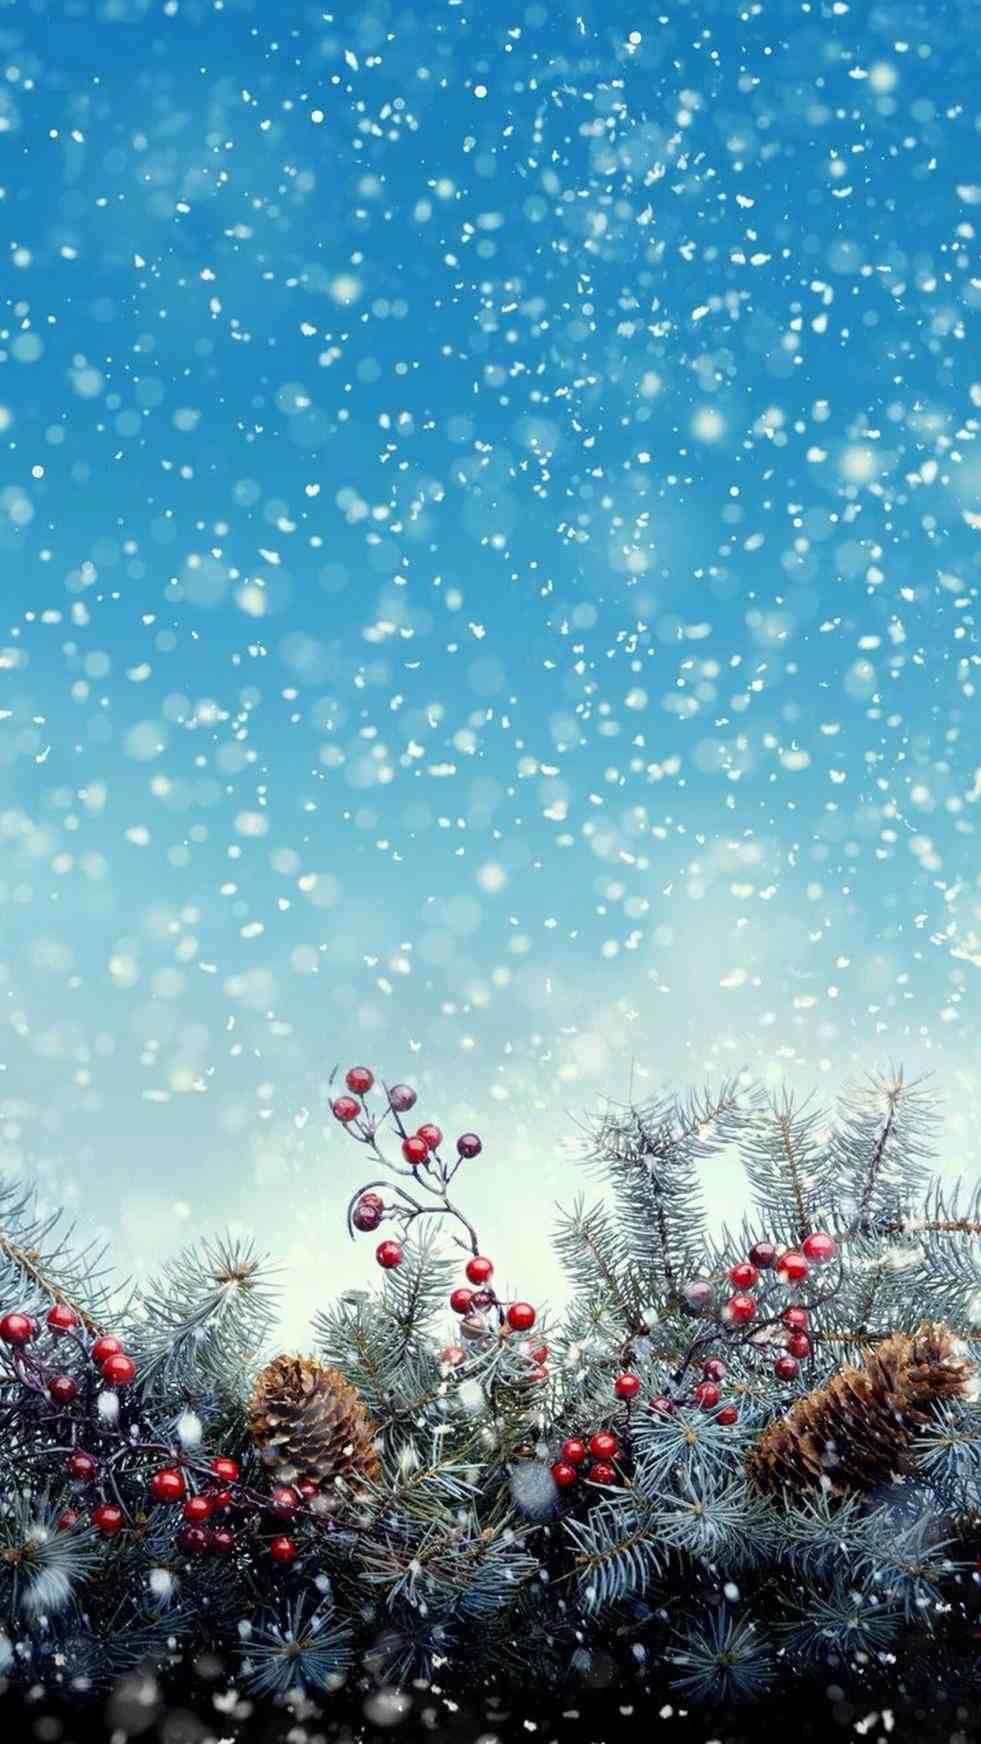 New Christmas Lights Snow Wallpaper Iphone At Temasistemi